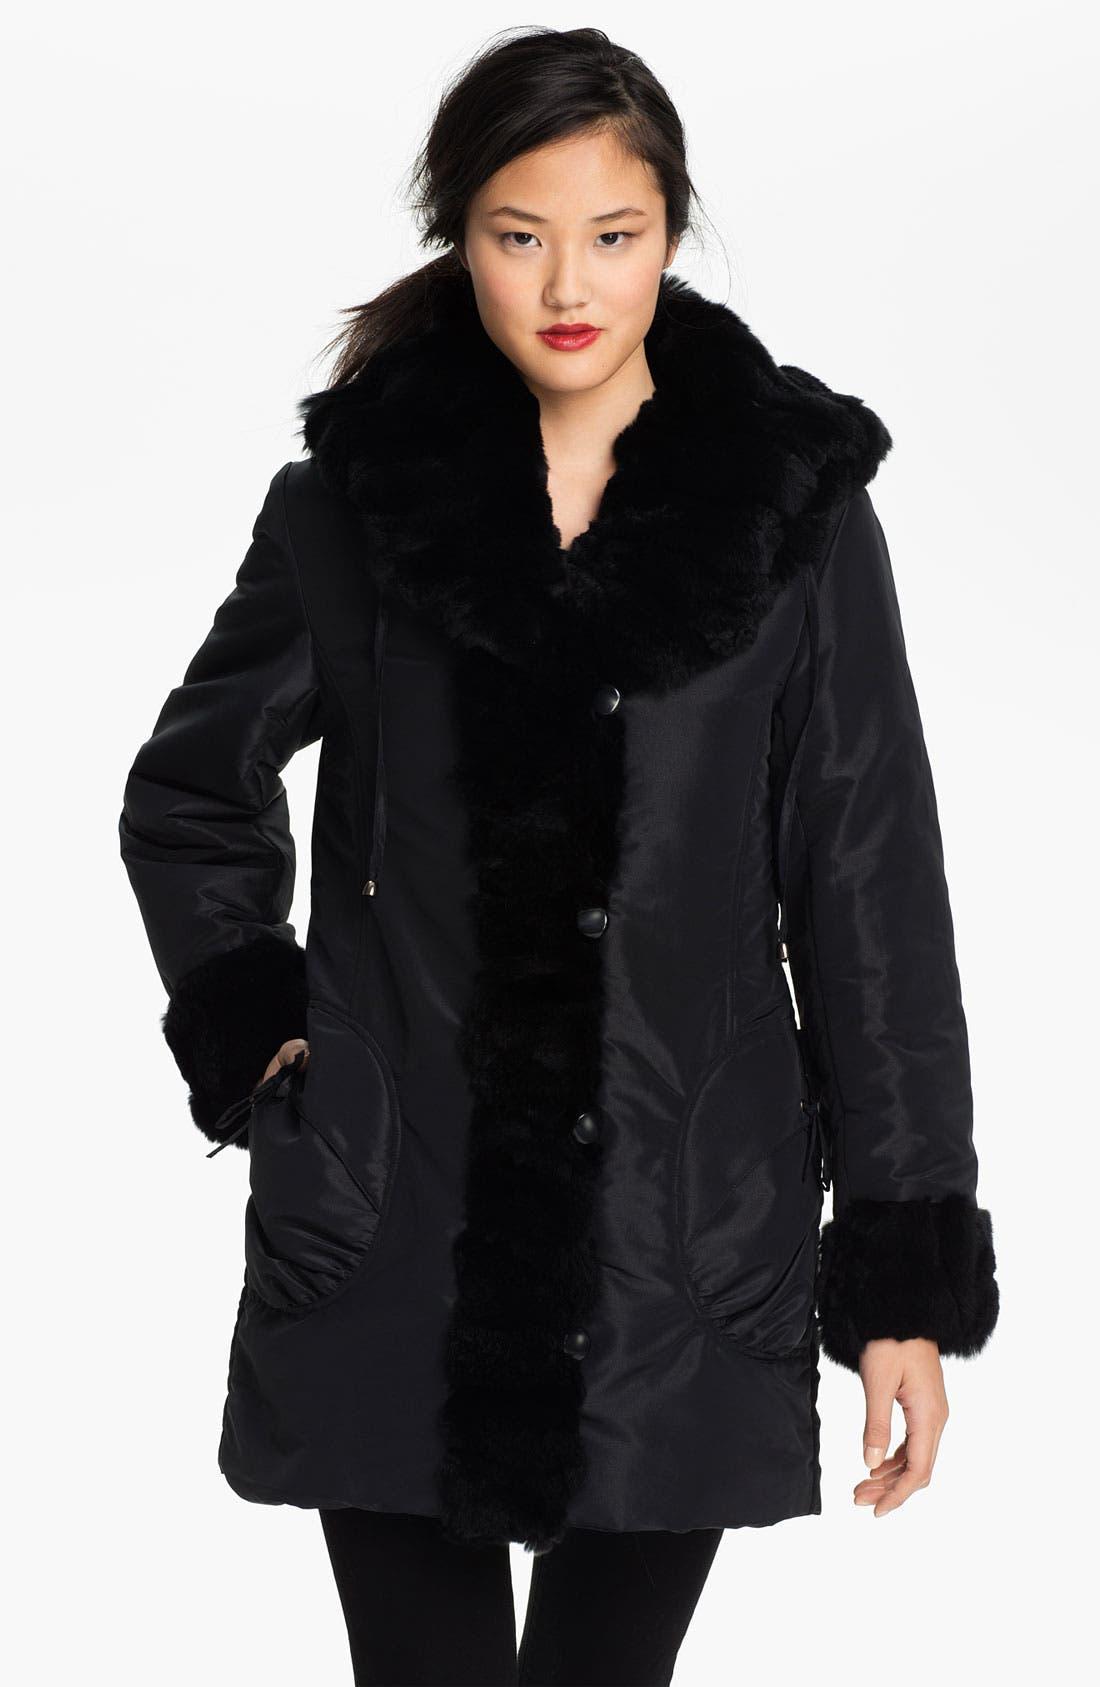 Alternate Image 1 Selected - Jessica Wilde Storm Coat with Genuine Rabbit Fur